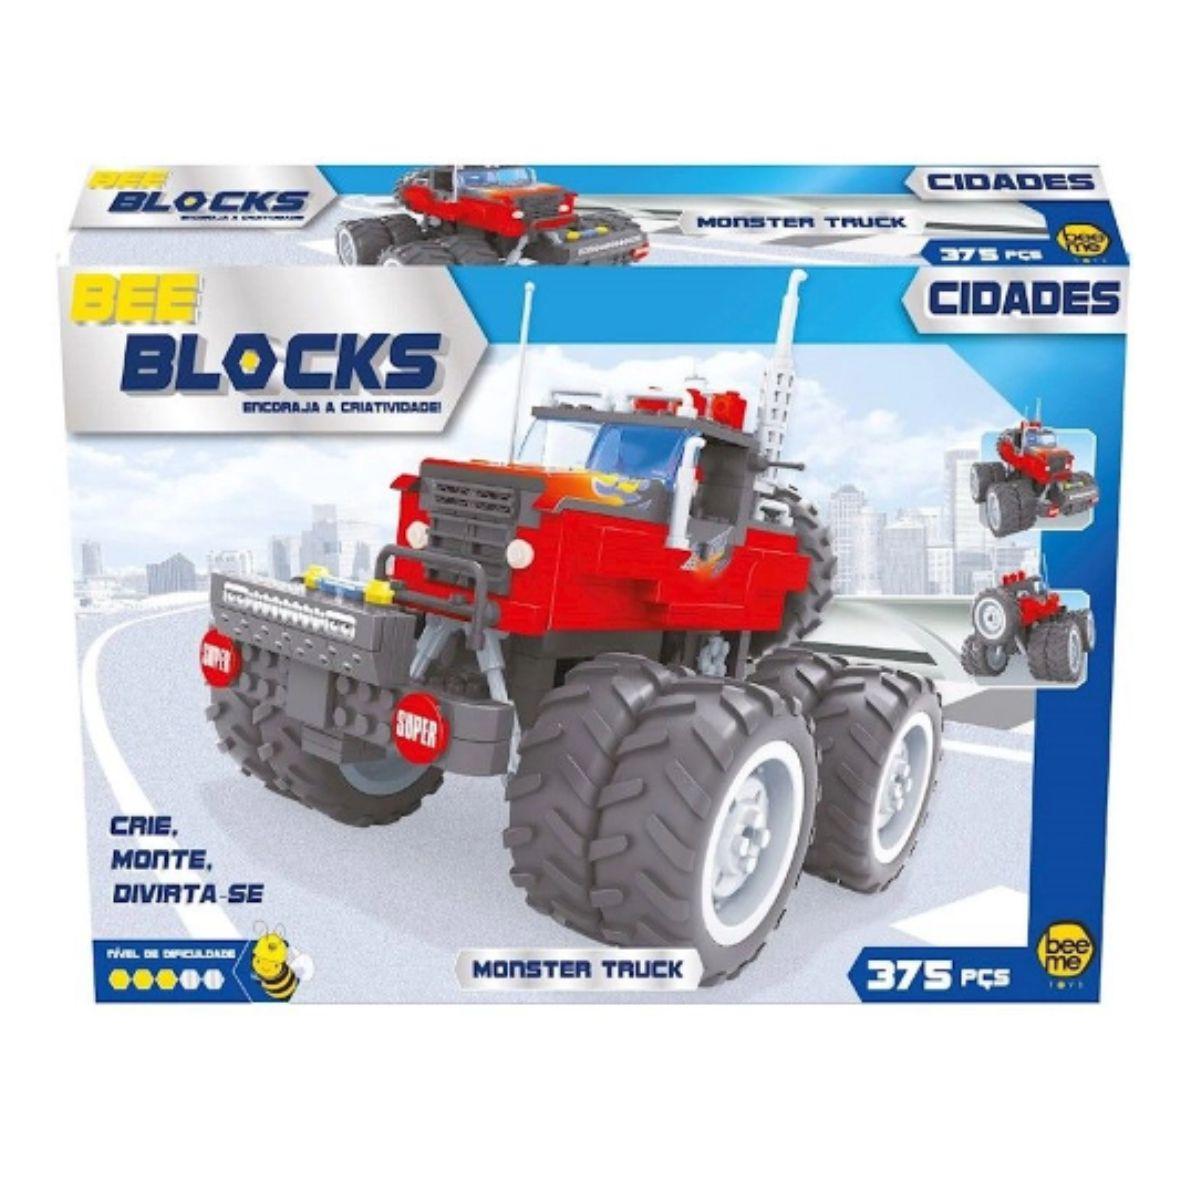 Blocos de Encaixe Bee Blocks Monster Truck - 375 peças - Beeme Toys